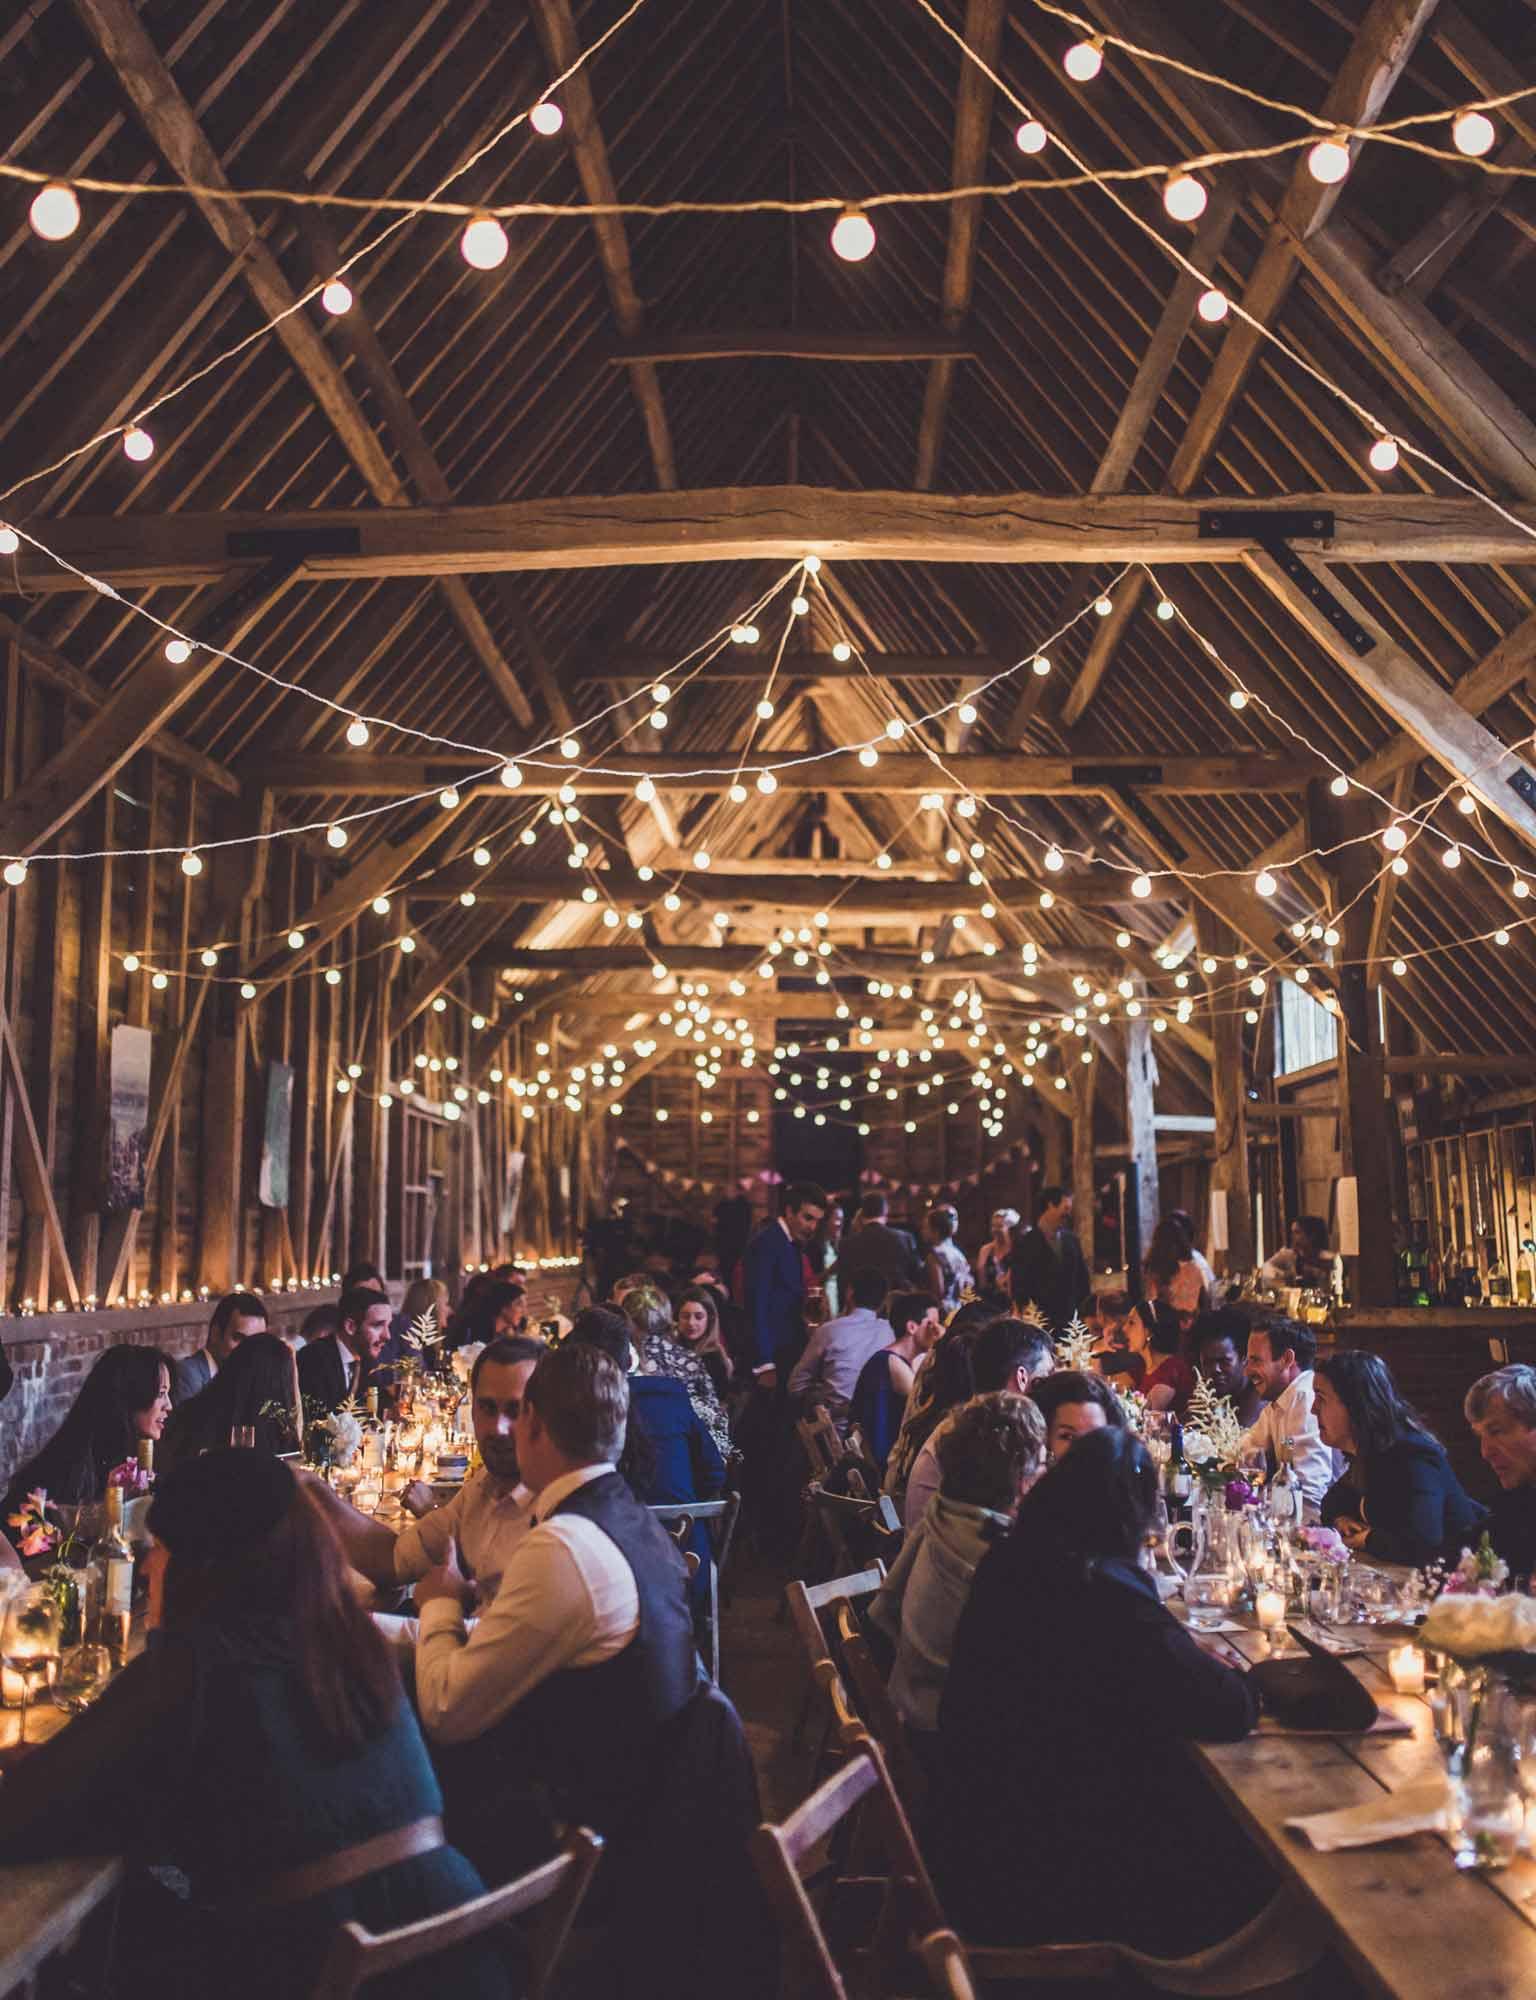 Barn Wedding Light Ideas   Lights4fun.co.uk